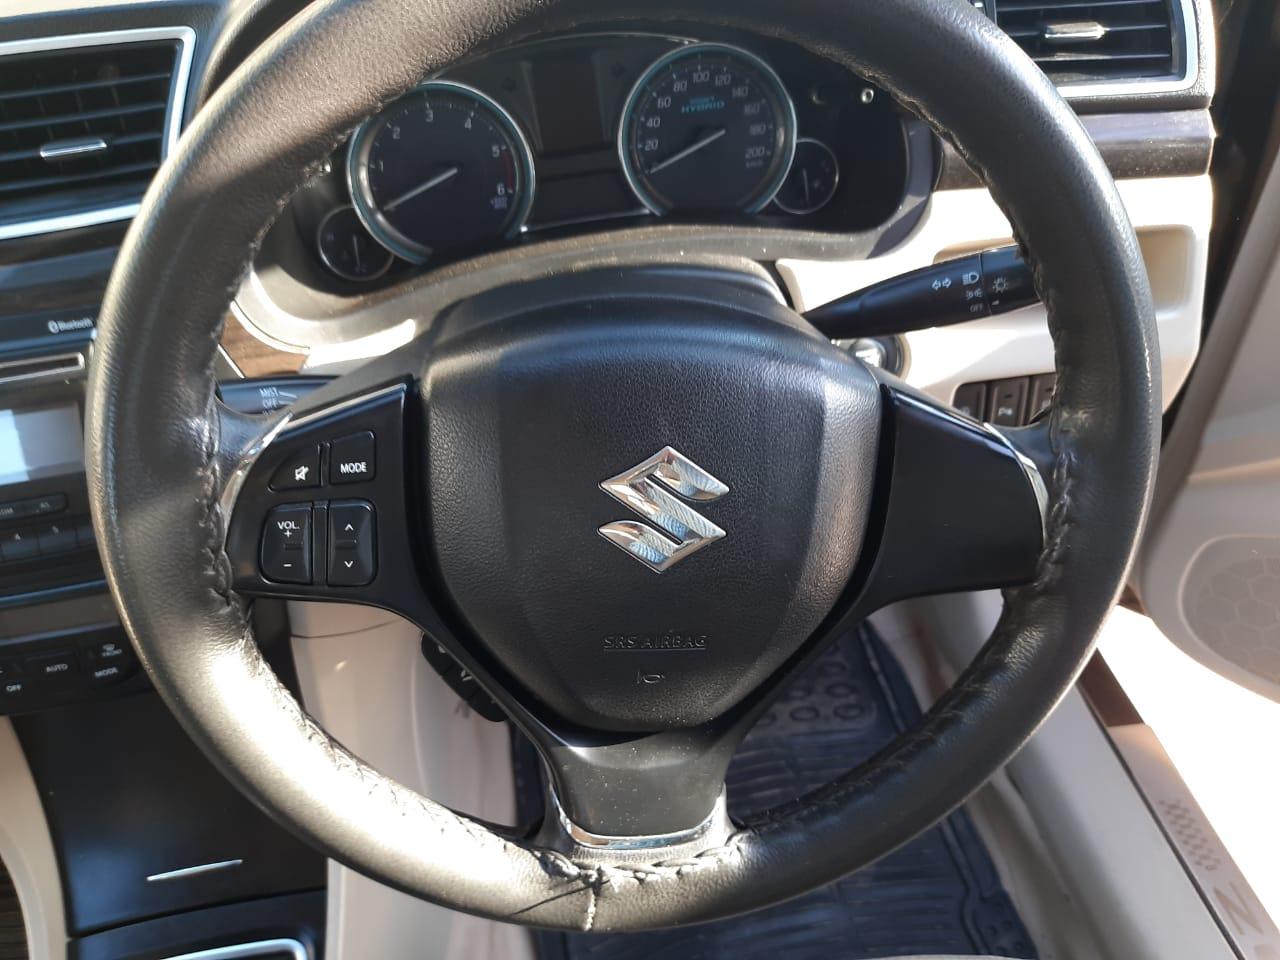 2017 Used MARUTI SUZUKI CIAZ ZDI MT SHVS